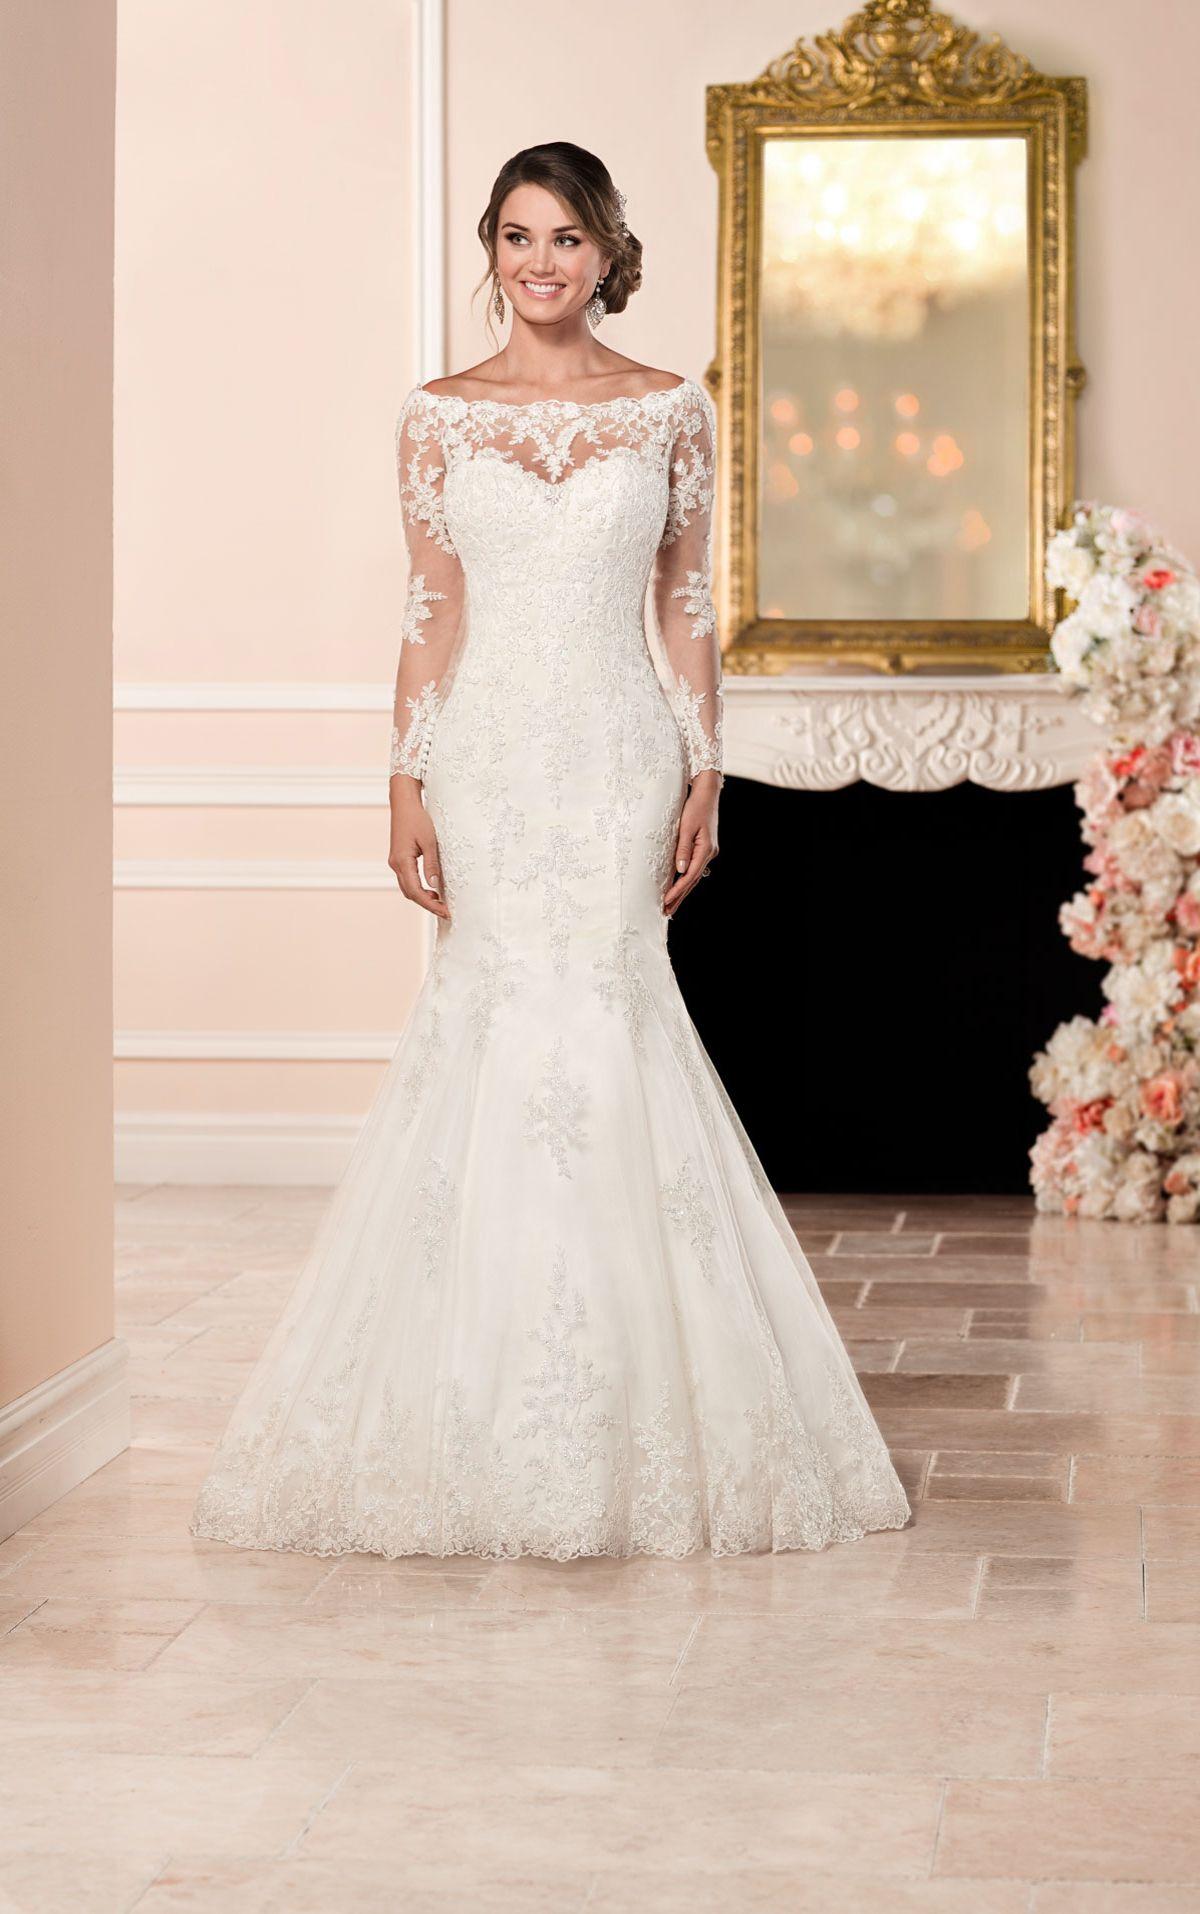 Long Sleeve Wedding Dress With Illusion Back Stella York Moda Nupcial Vestido De Casamento Vestido De Casamento Sereia [ 1914 x 1200 Pixel ]